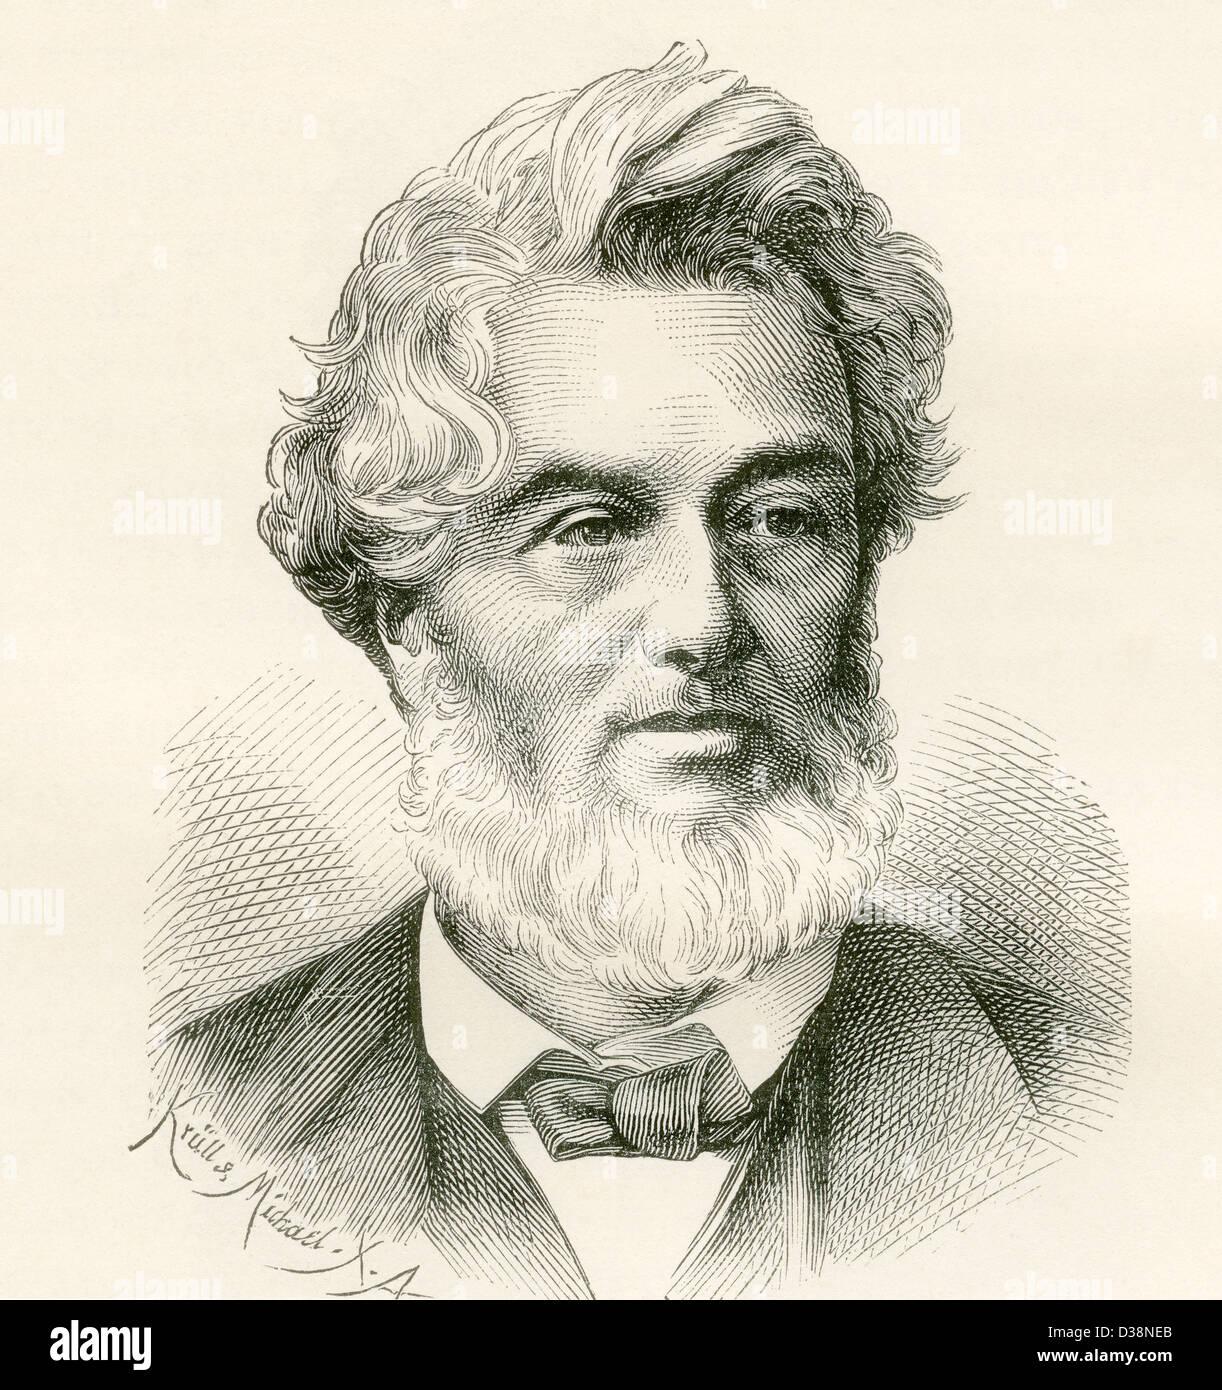 Jules Claude Gabriel Favre, 1809 – 1880. French statesman. - Stock Image